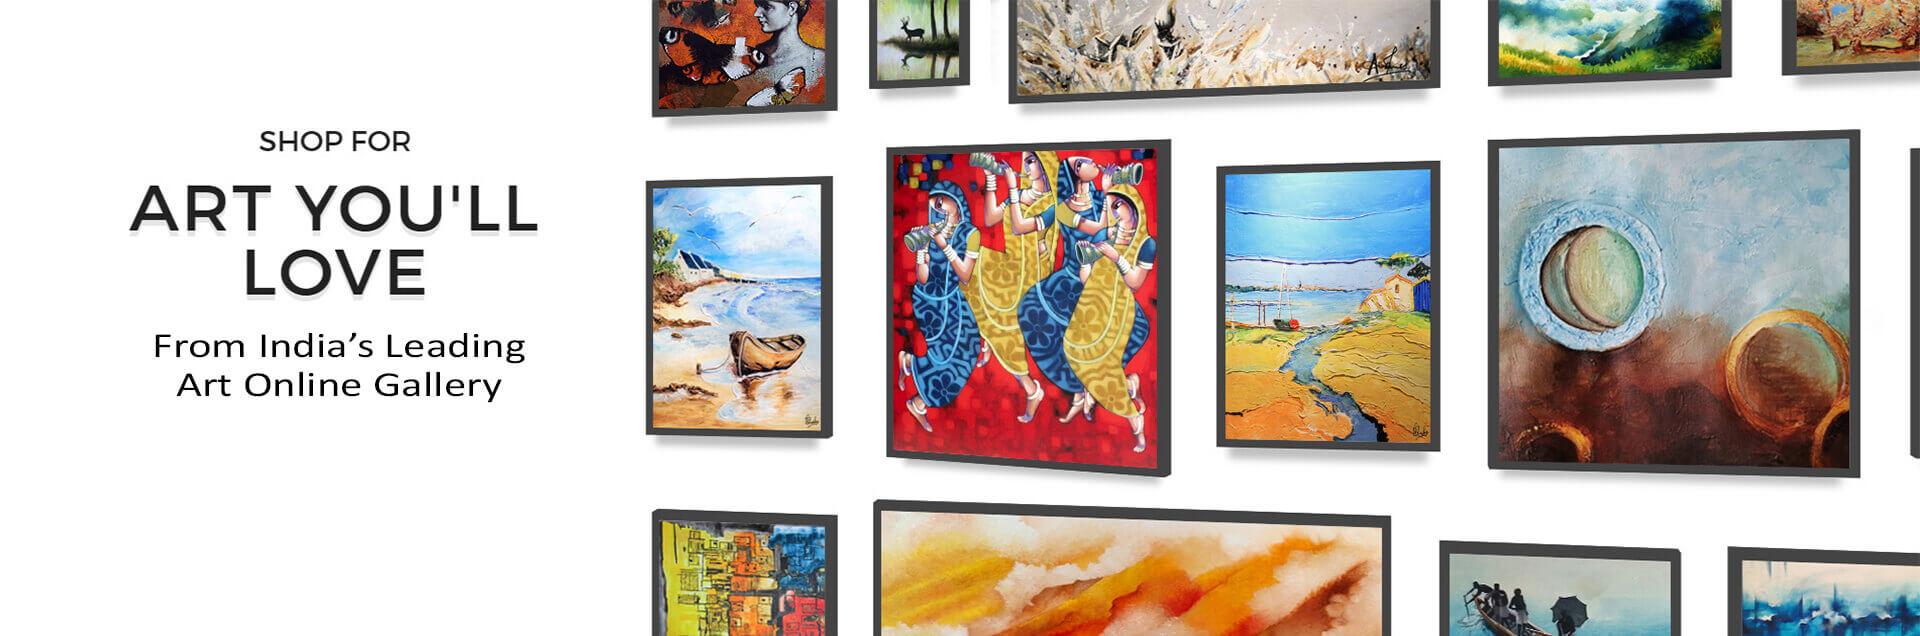 Canvas Painting Online Art Gallery Original Wall Art Paintings